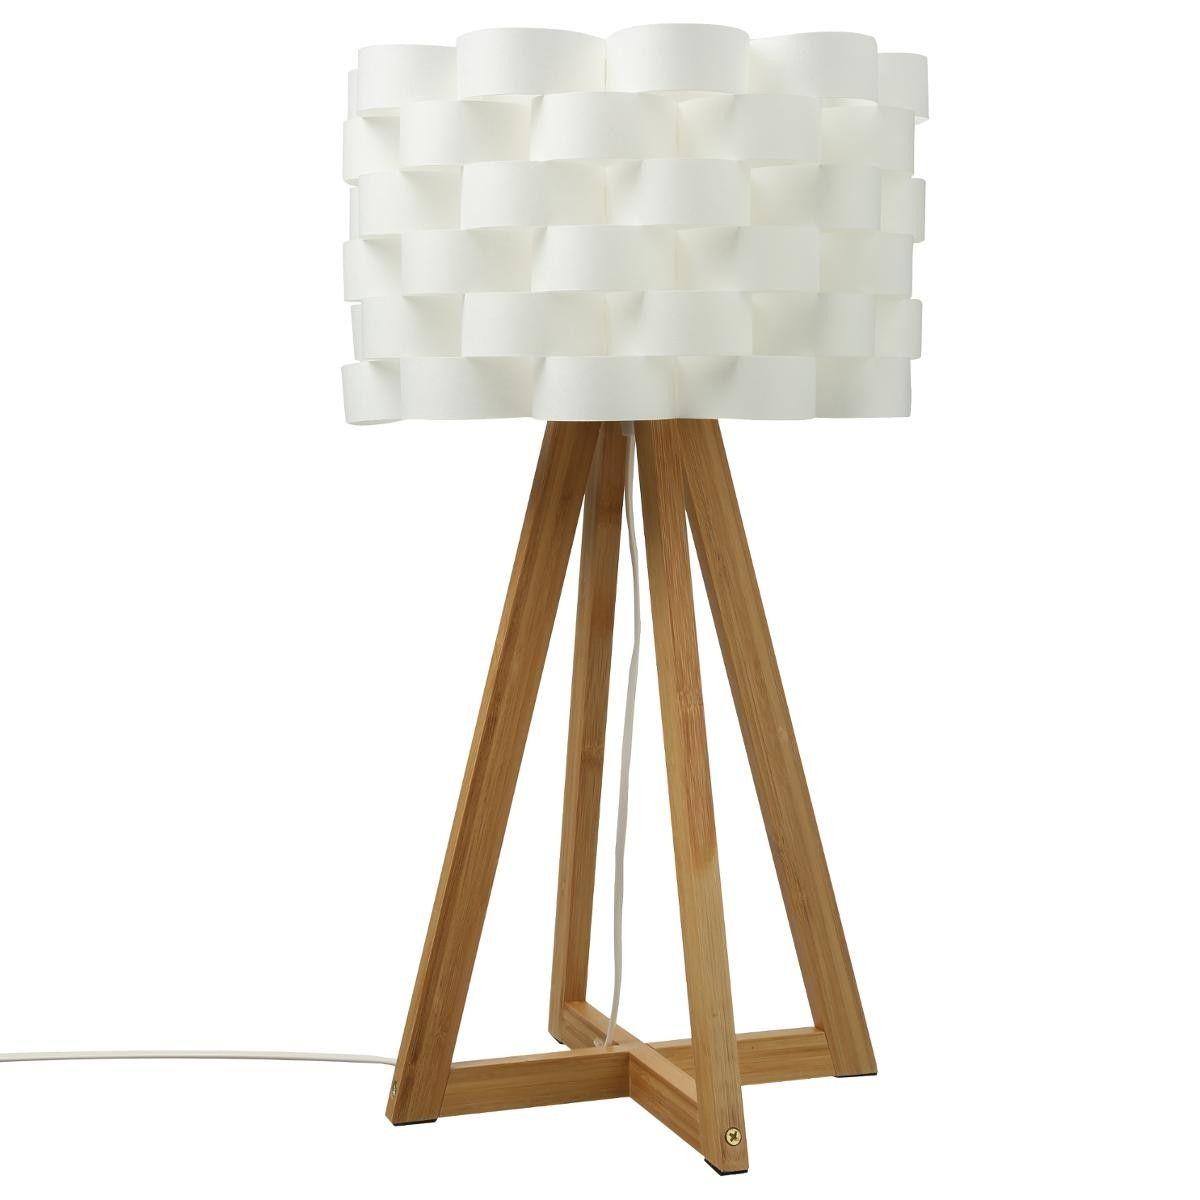 Lampe bambou papier MOKI H55 Lampe à poser, blanc, prise